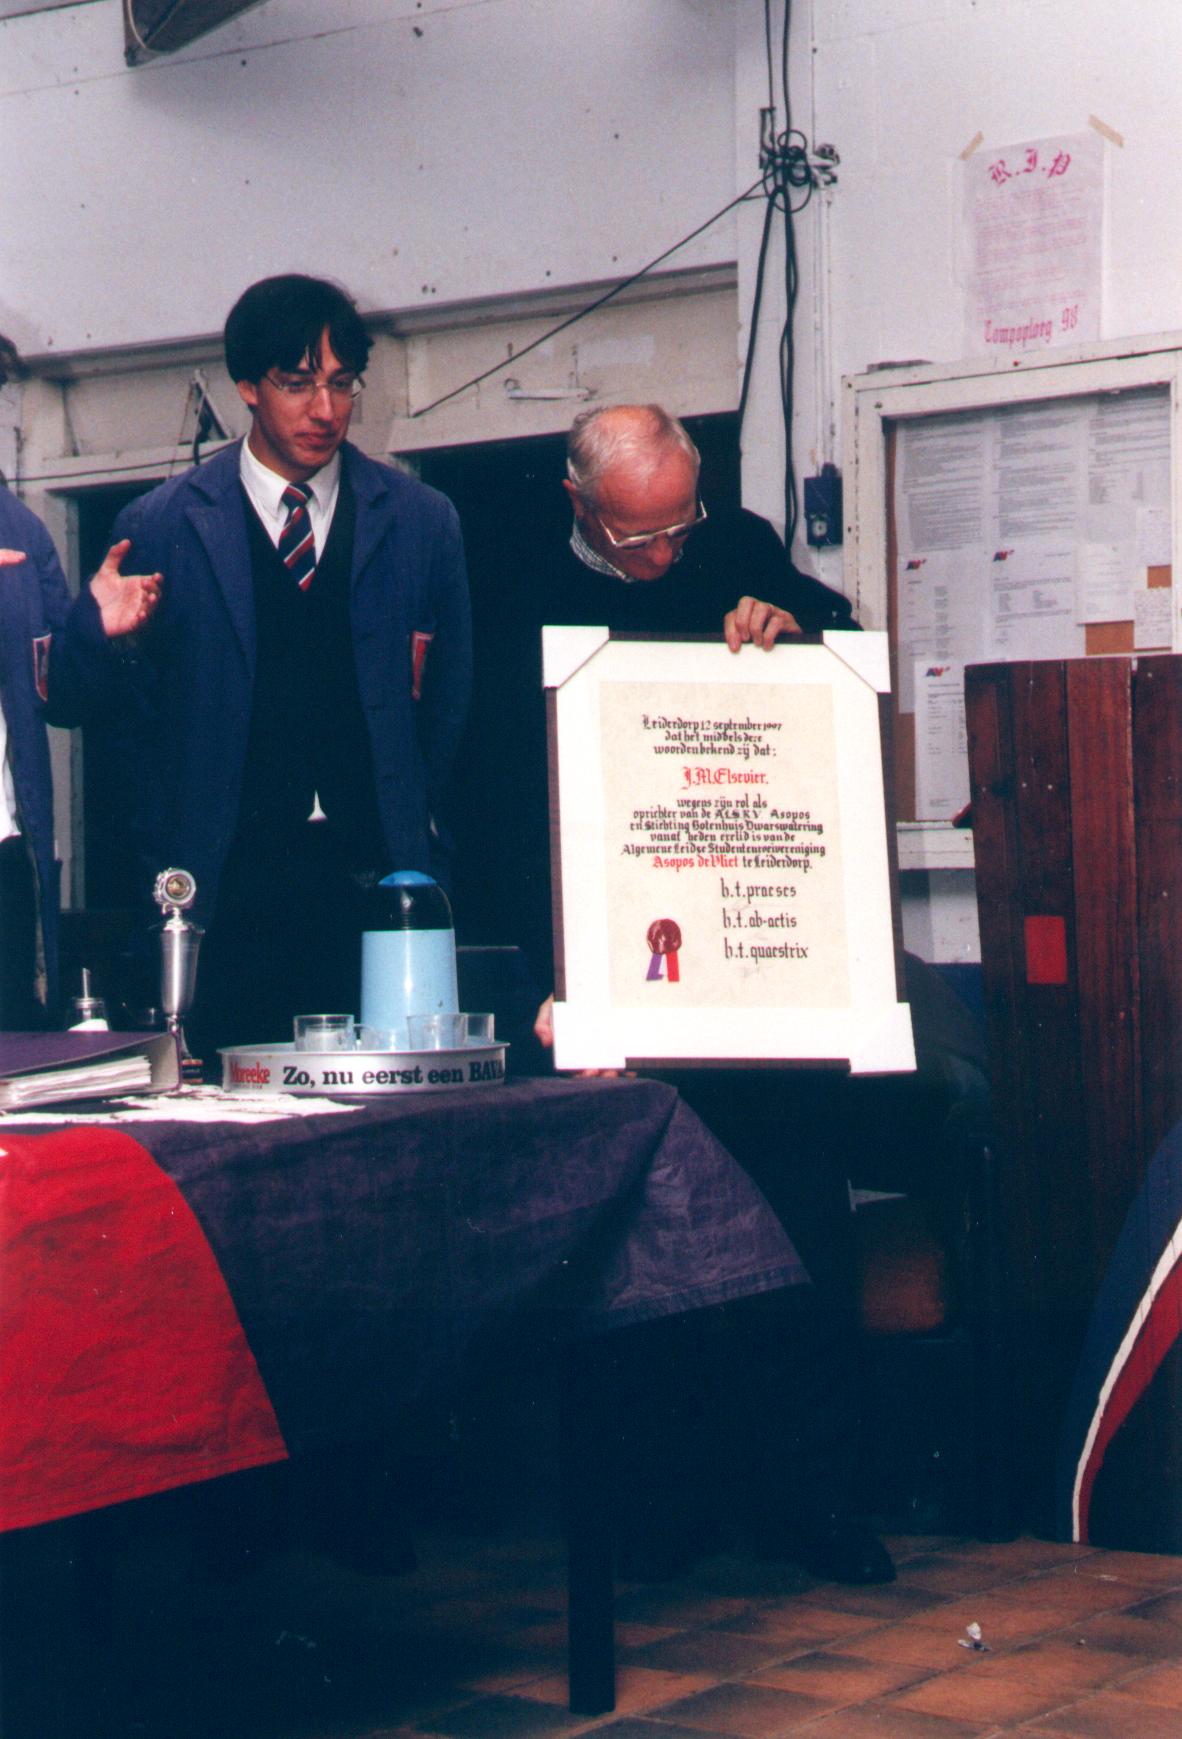 1998-Erelidmaatschap Elsevier op W-ALV